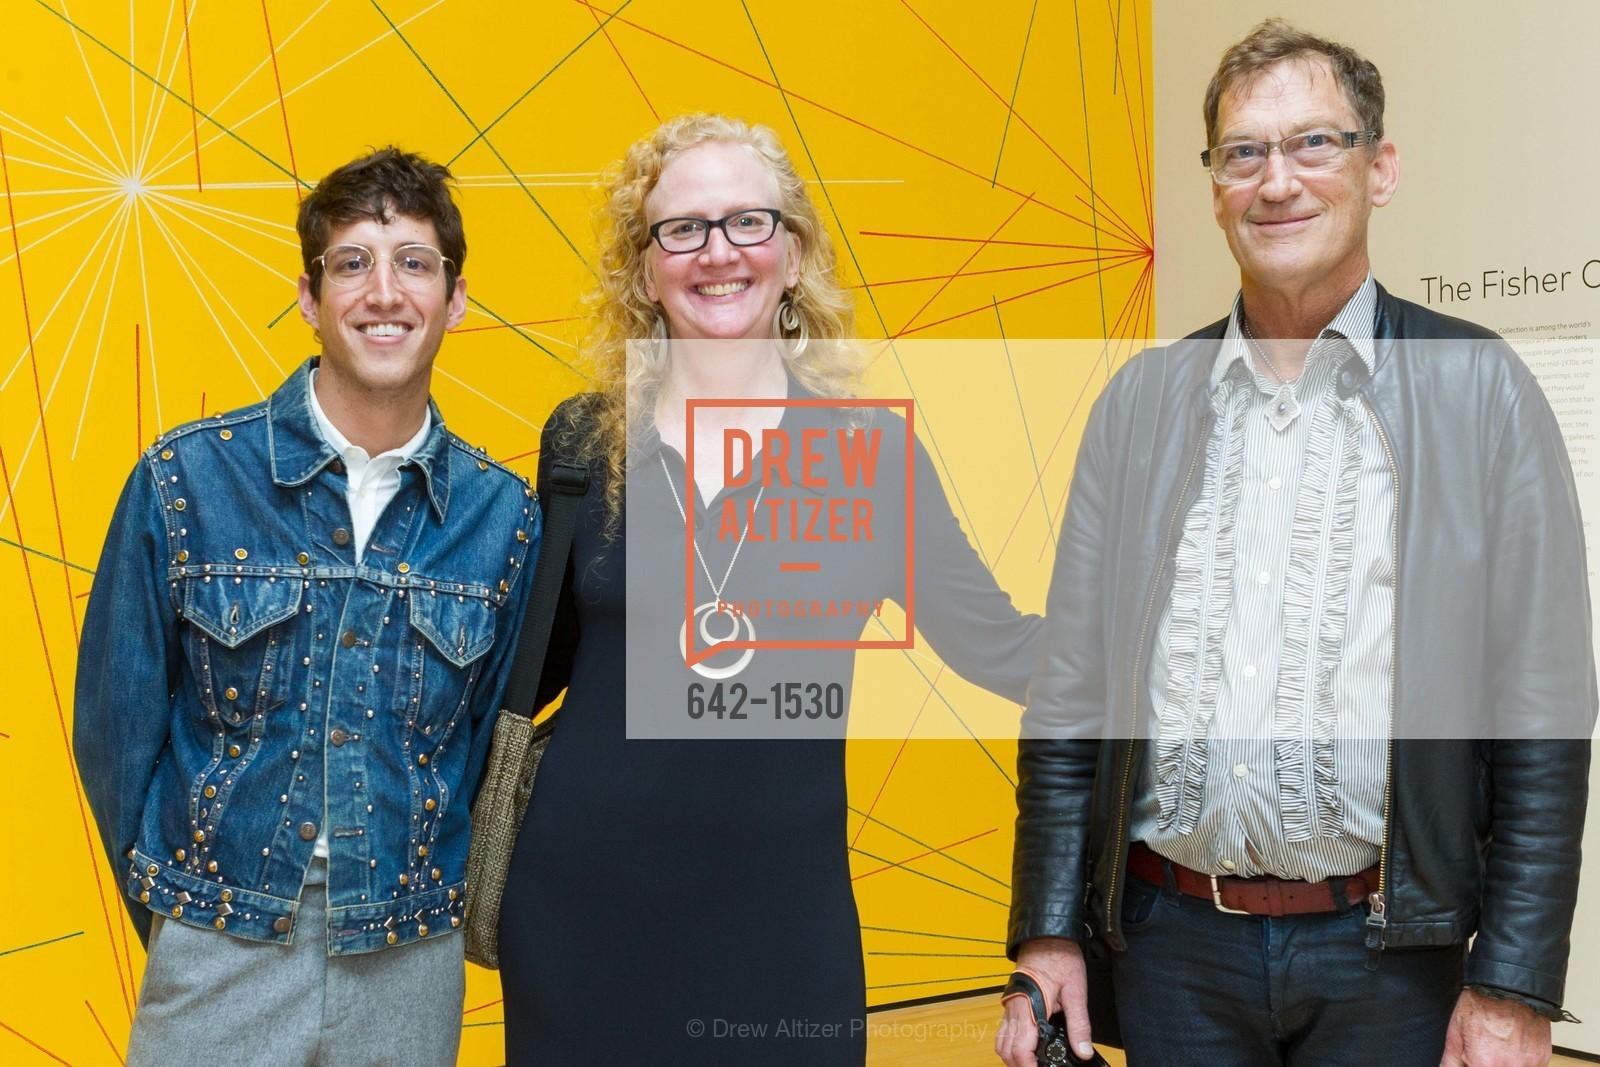 Sam Parker, Anastasia Aukeman, Richard Peterson, Photo #642-1530